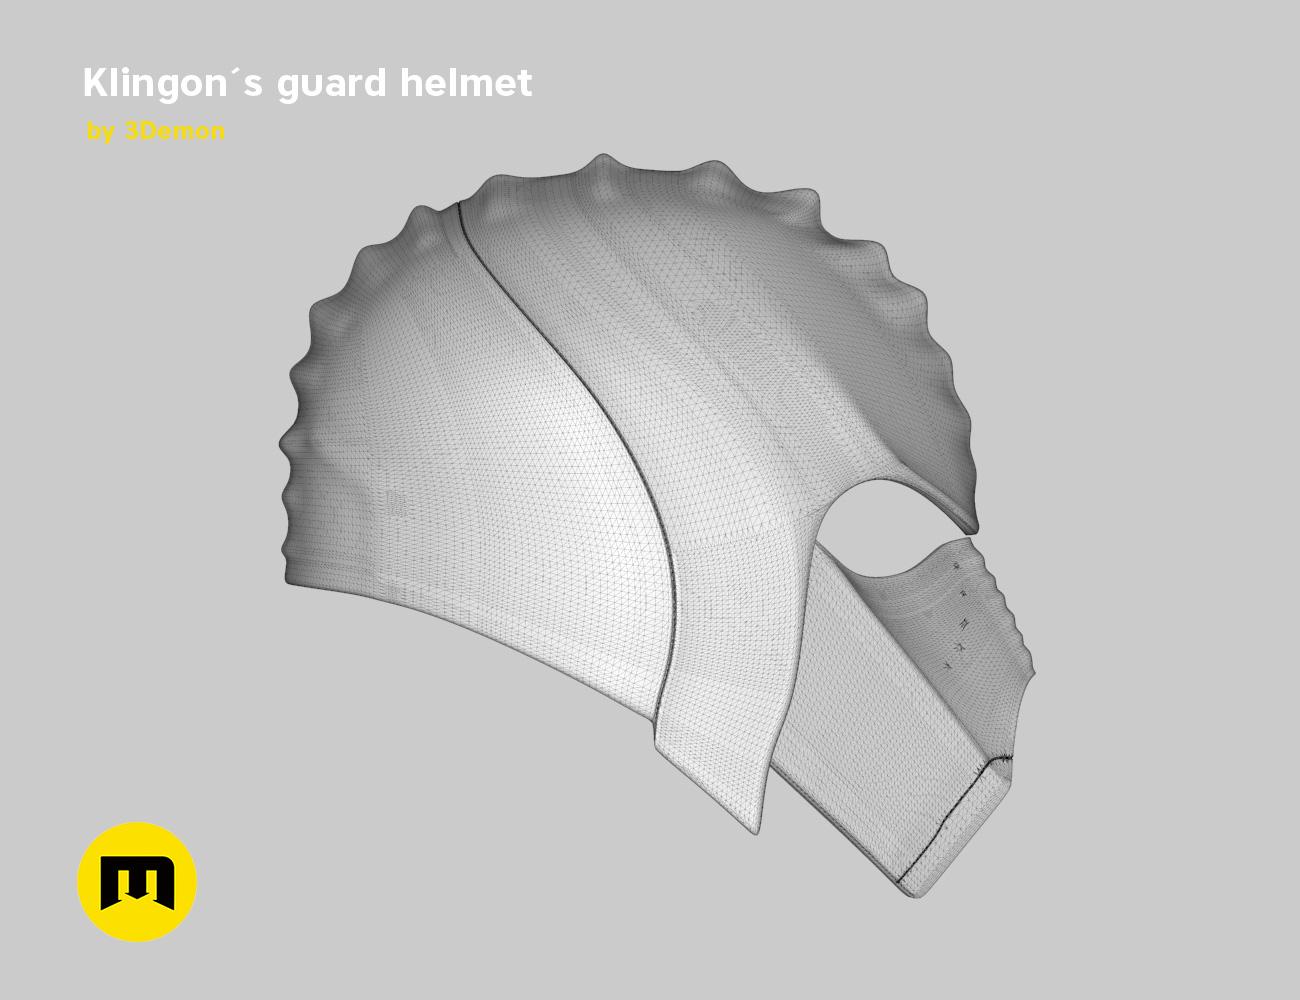 render_klingon_mesh.45.jpg Download STL file Klingon guard helmet • 3D printer object, 3D-mon